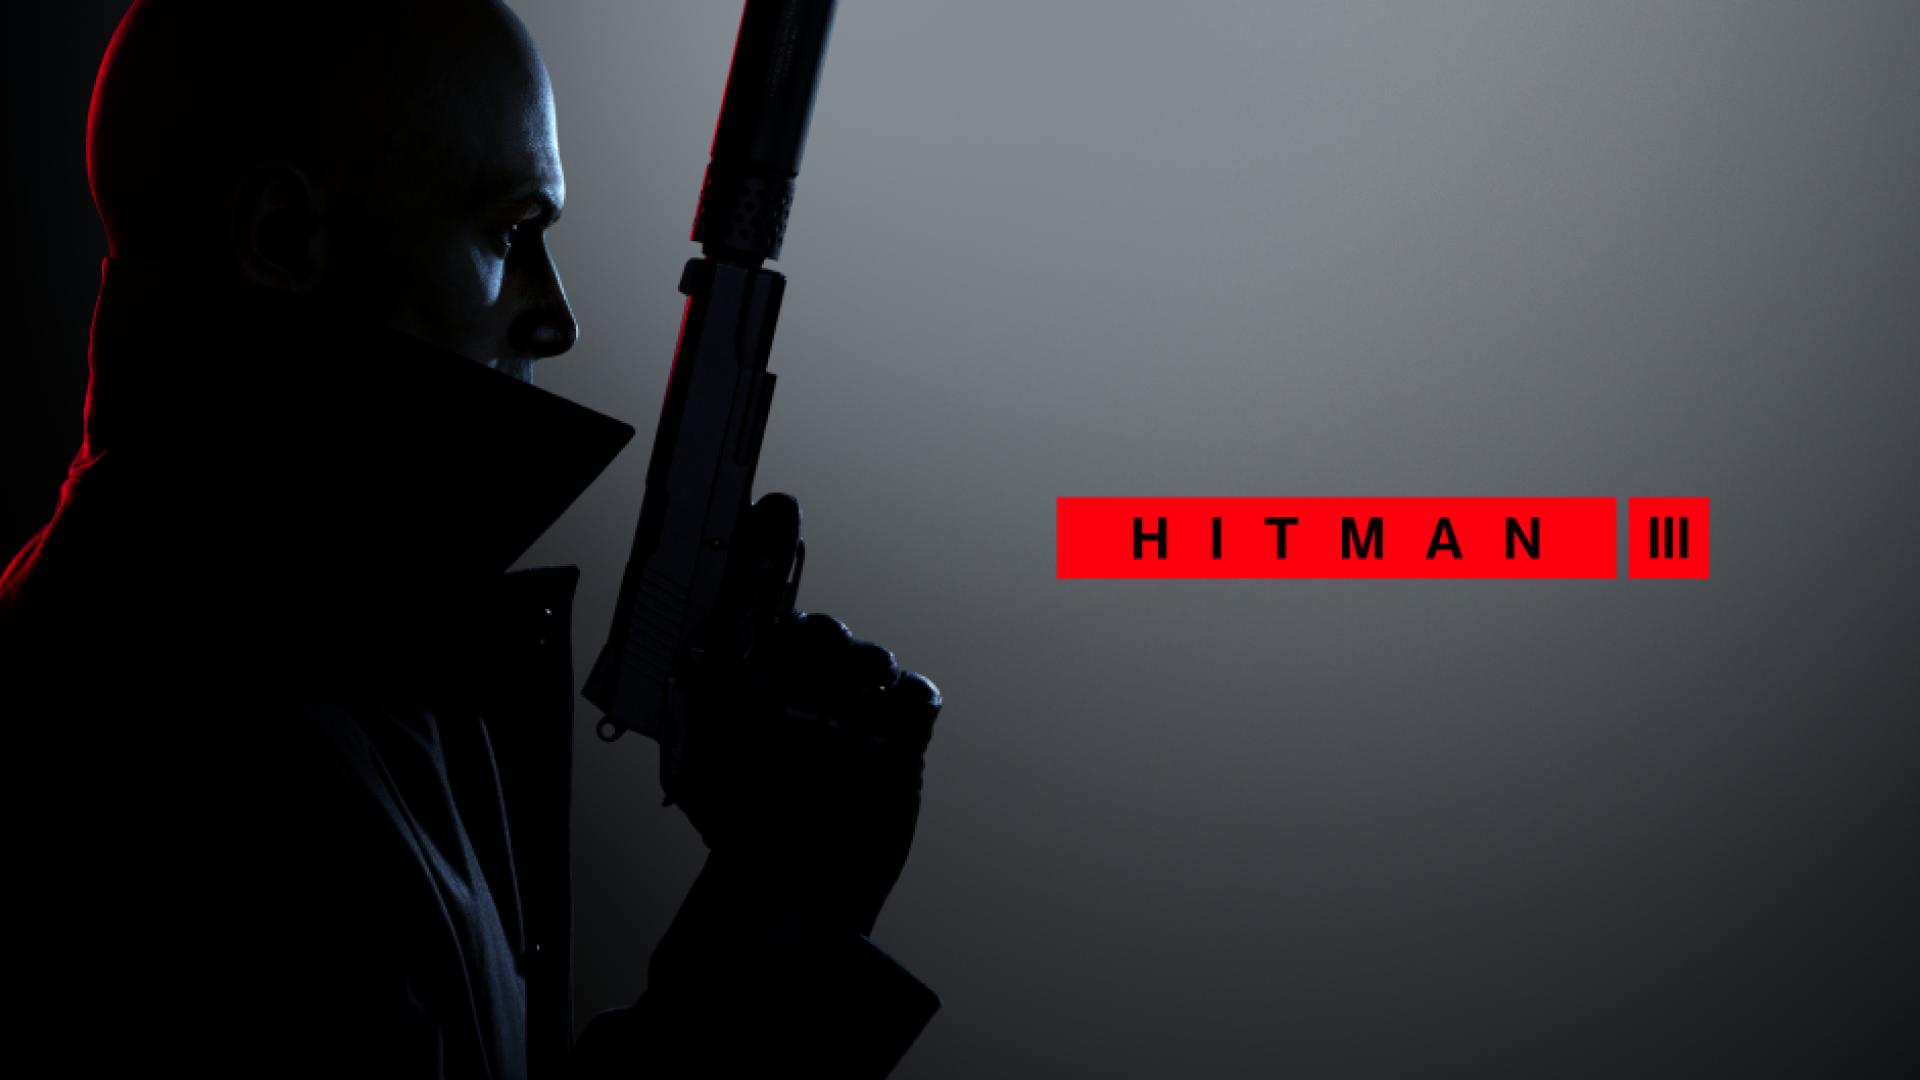 Hitman Key Art 3